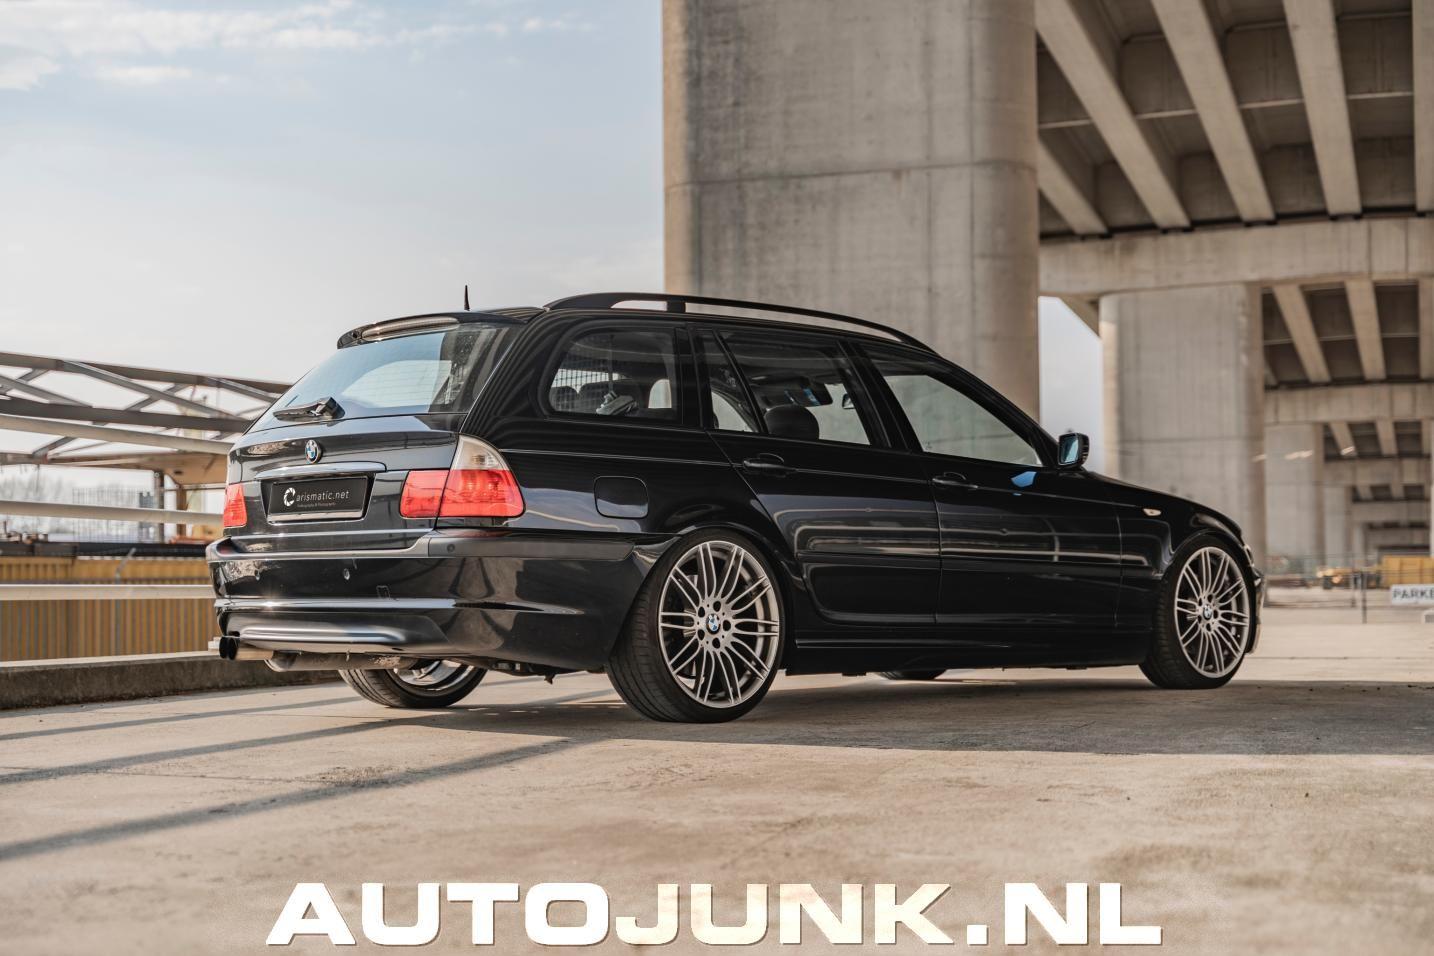 Bmw E46 330d Touring Style 269 Bmw Performance Velgen